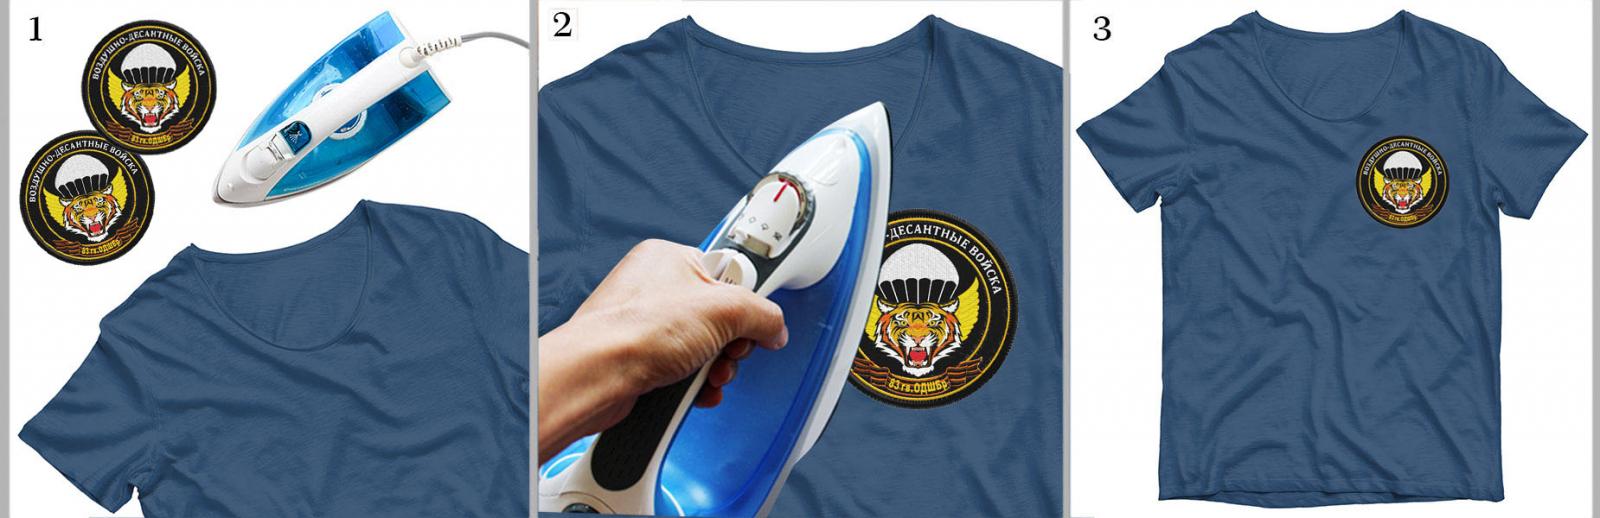 Шеврон десантника 83 гв. ОДШБр на футболке